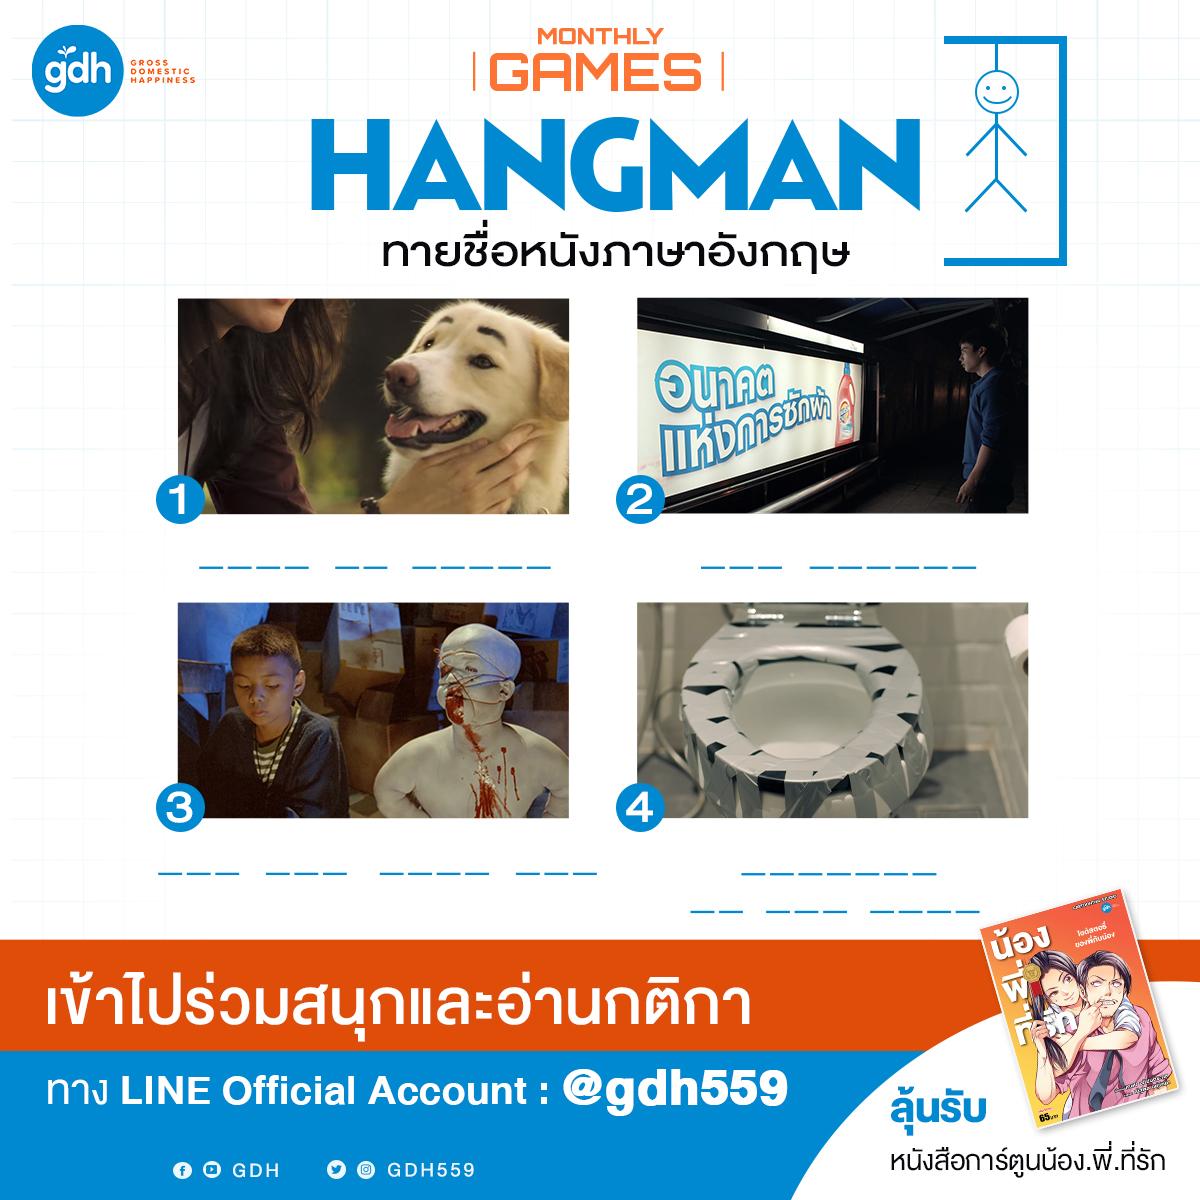 Hangman เกมทายชื่อหนังภาษาอังกฤษ   เข้าไปร่วมสนุกและอ่านกติกา  ทาง LINE Official Account : GDH >> https://t.co/HIgykdprMH  #GDH https://t.co/a5c1xDqlHQ